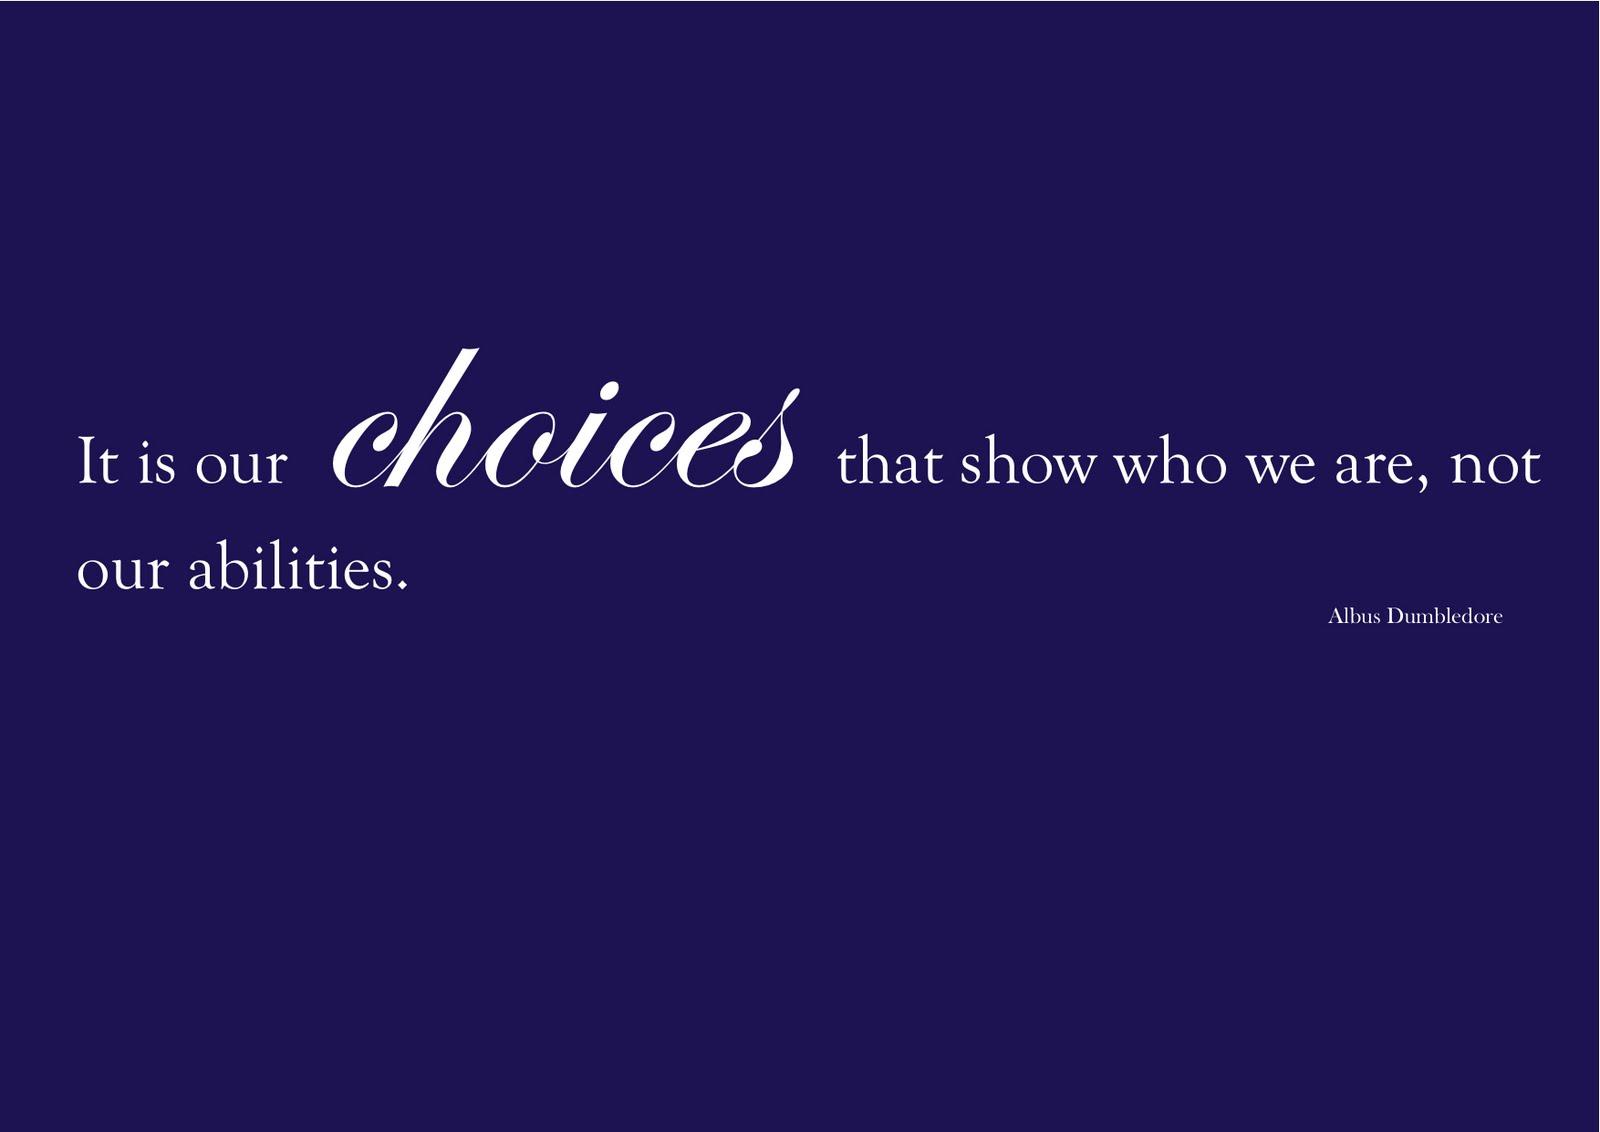 Good Wallpaper Harry Potter Purple - Choices+-+Dumbledore  You Should Have_234865.jpg